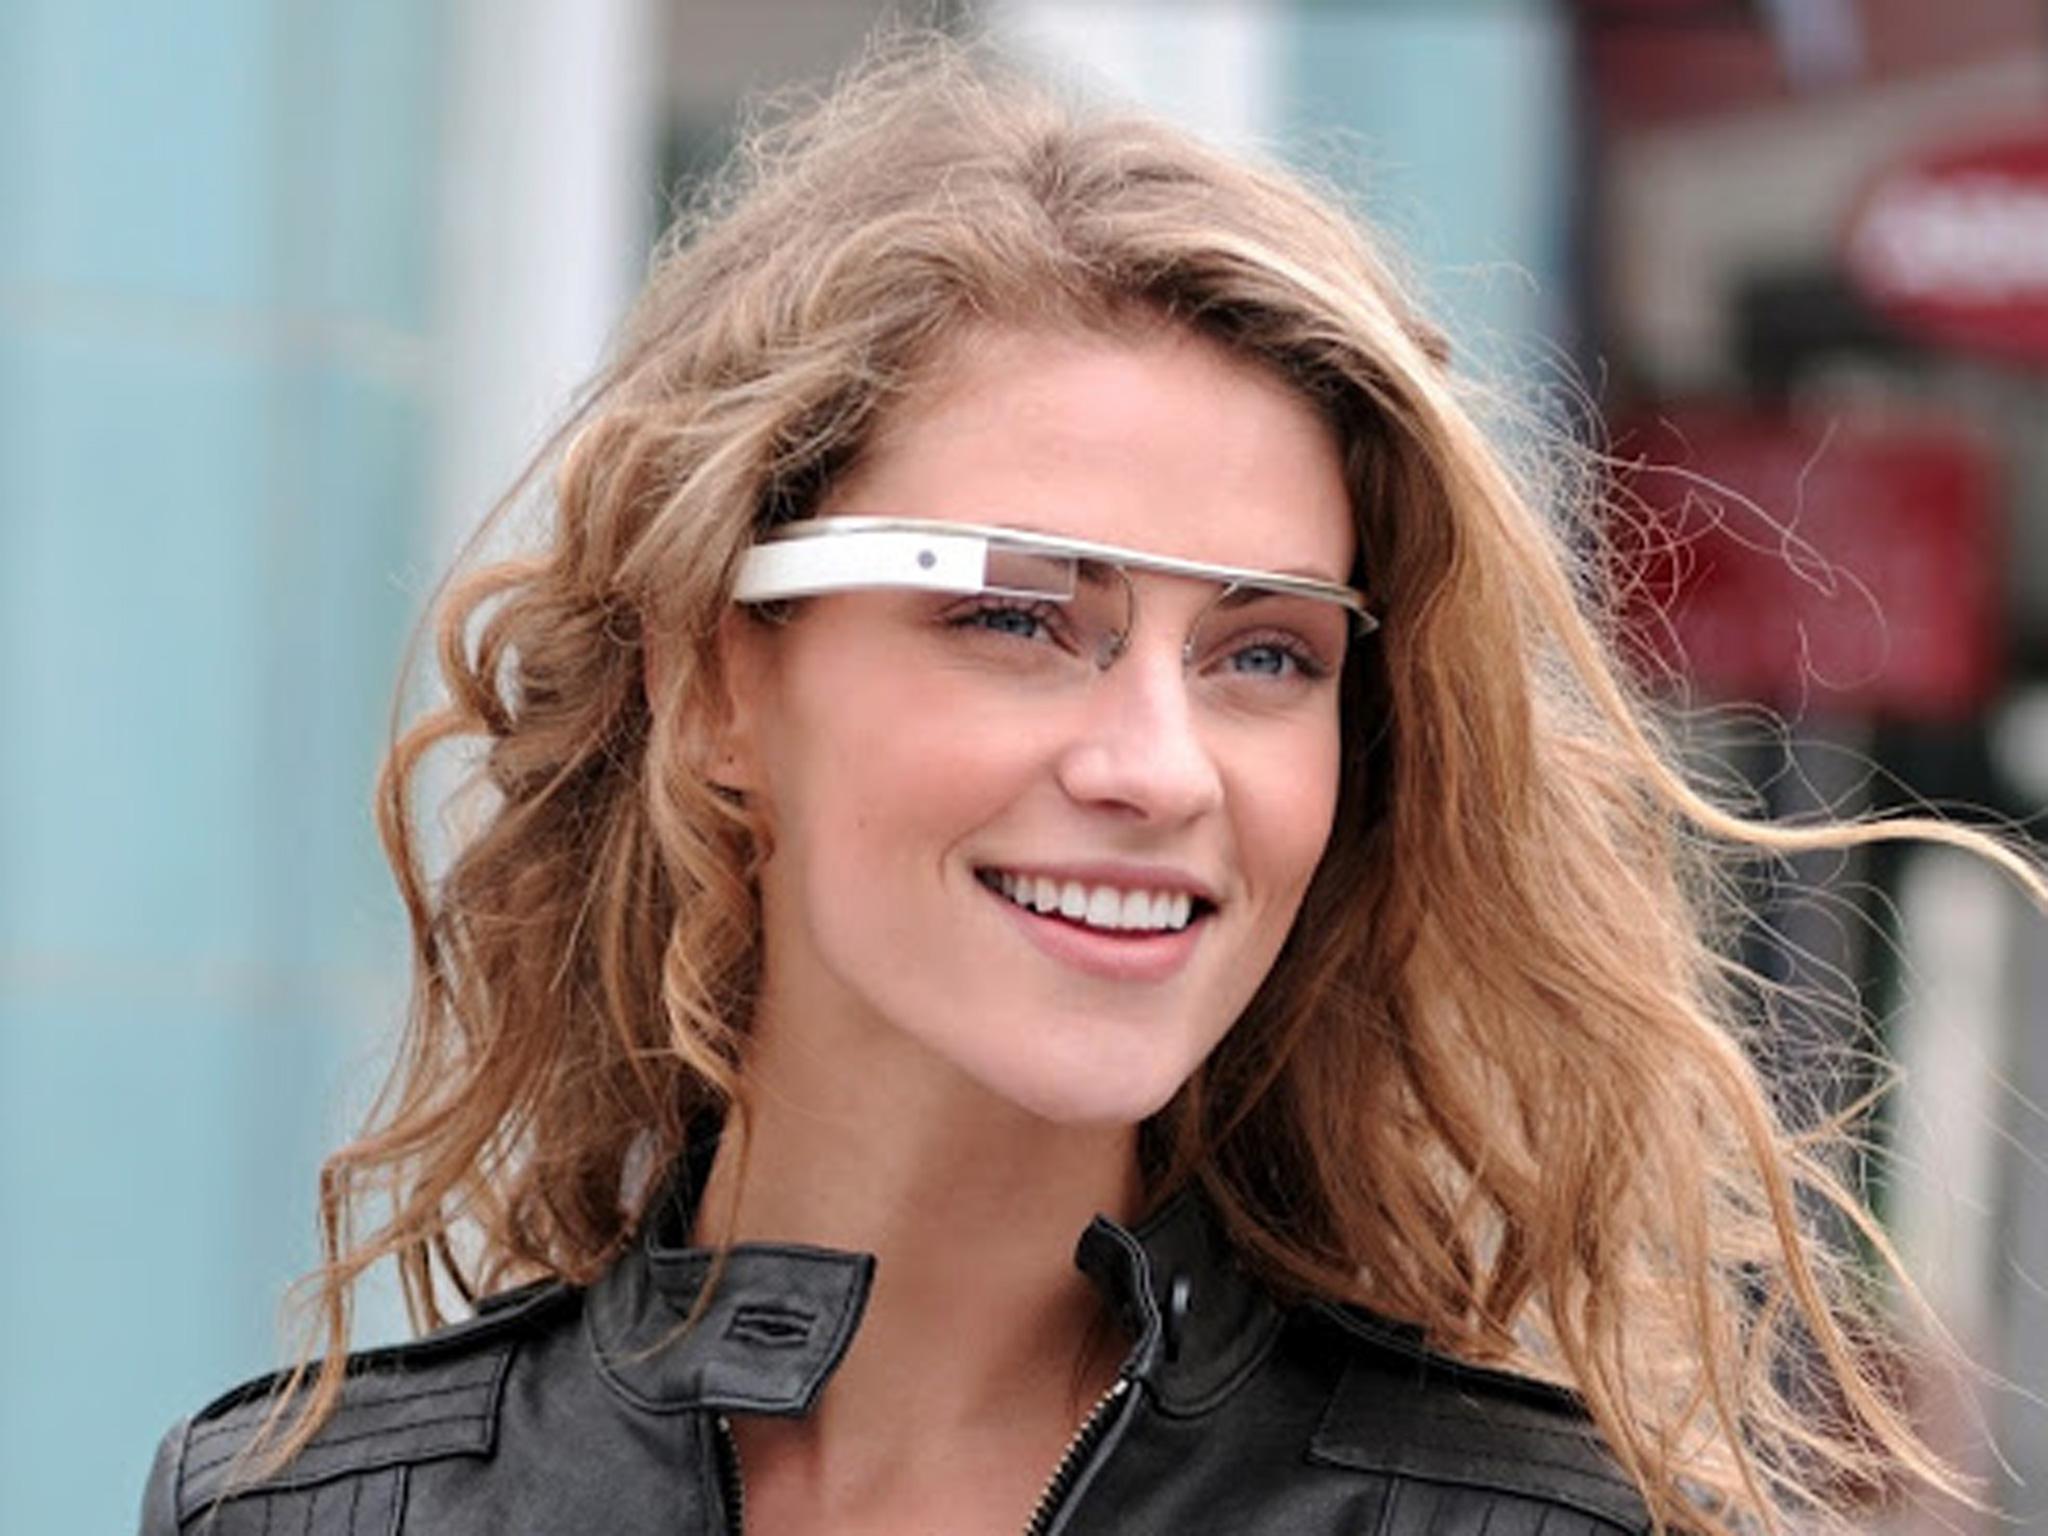 Beautiful Model Introducing Black Google glass